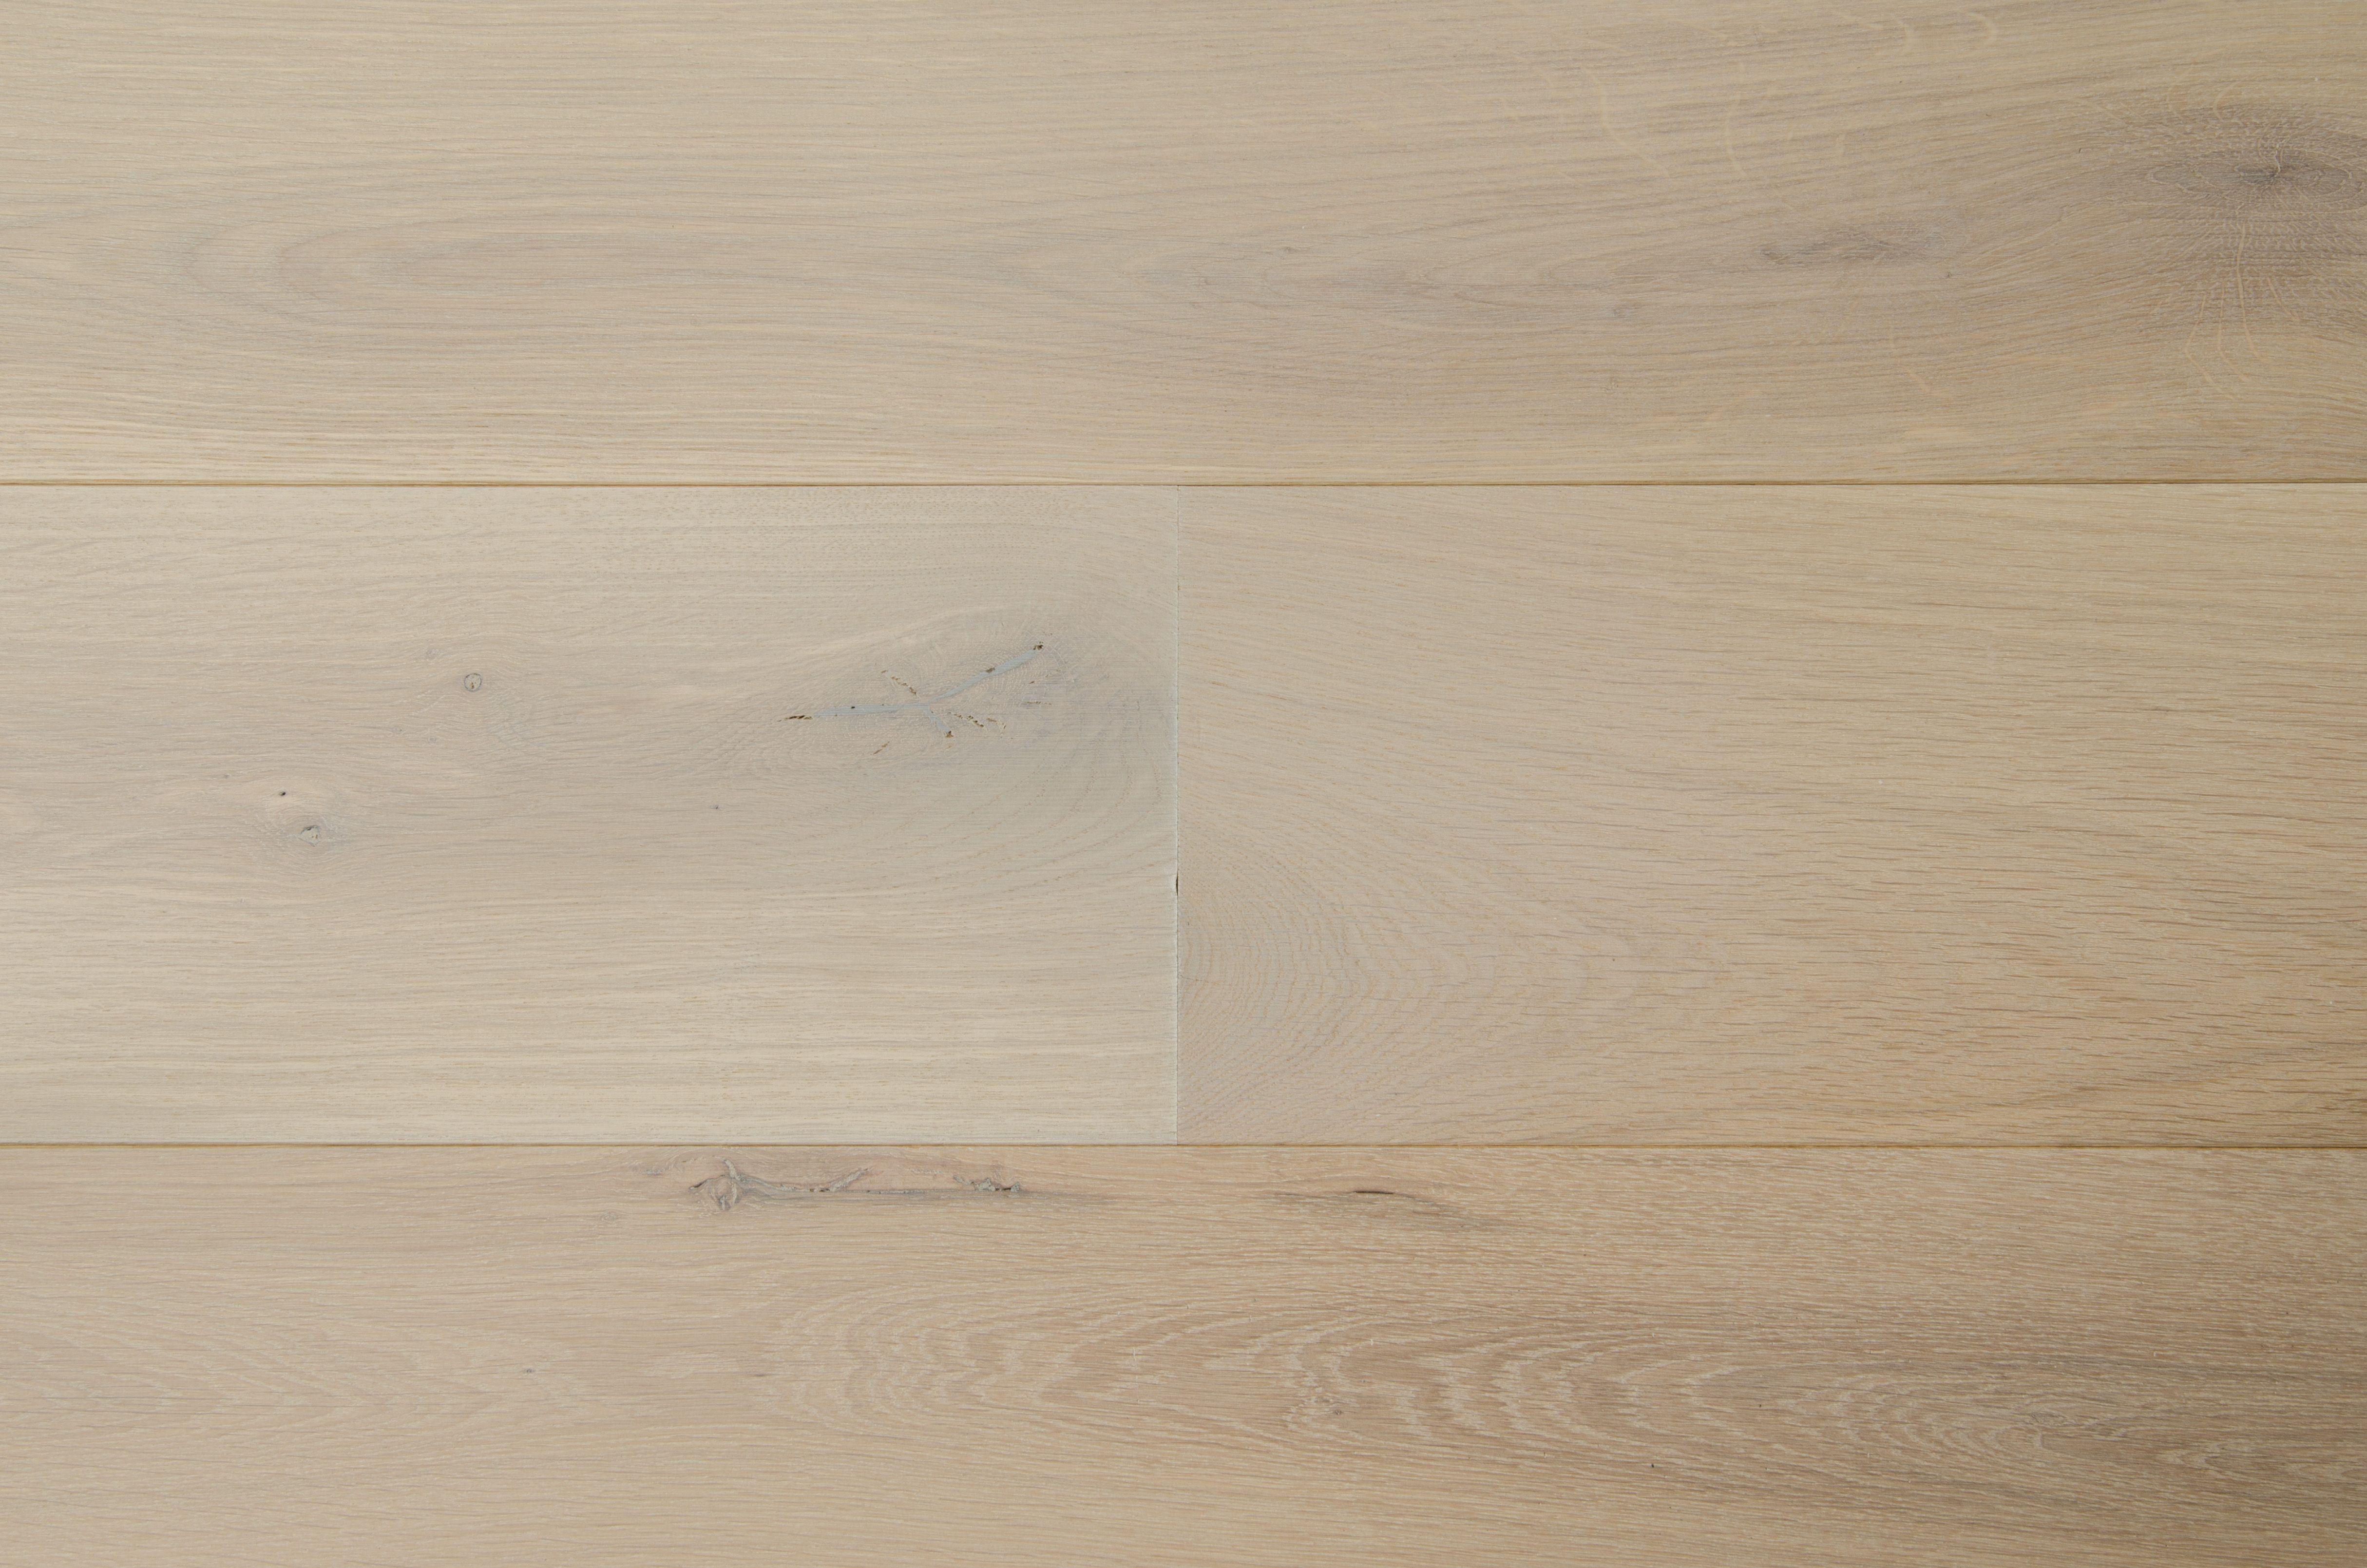 1 2 hardwood flooring of european oak naples species european oak color naples intended for european oak naples species european oak color